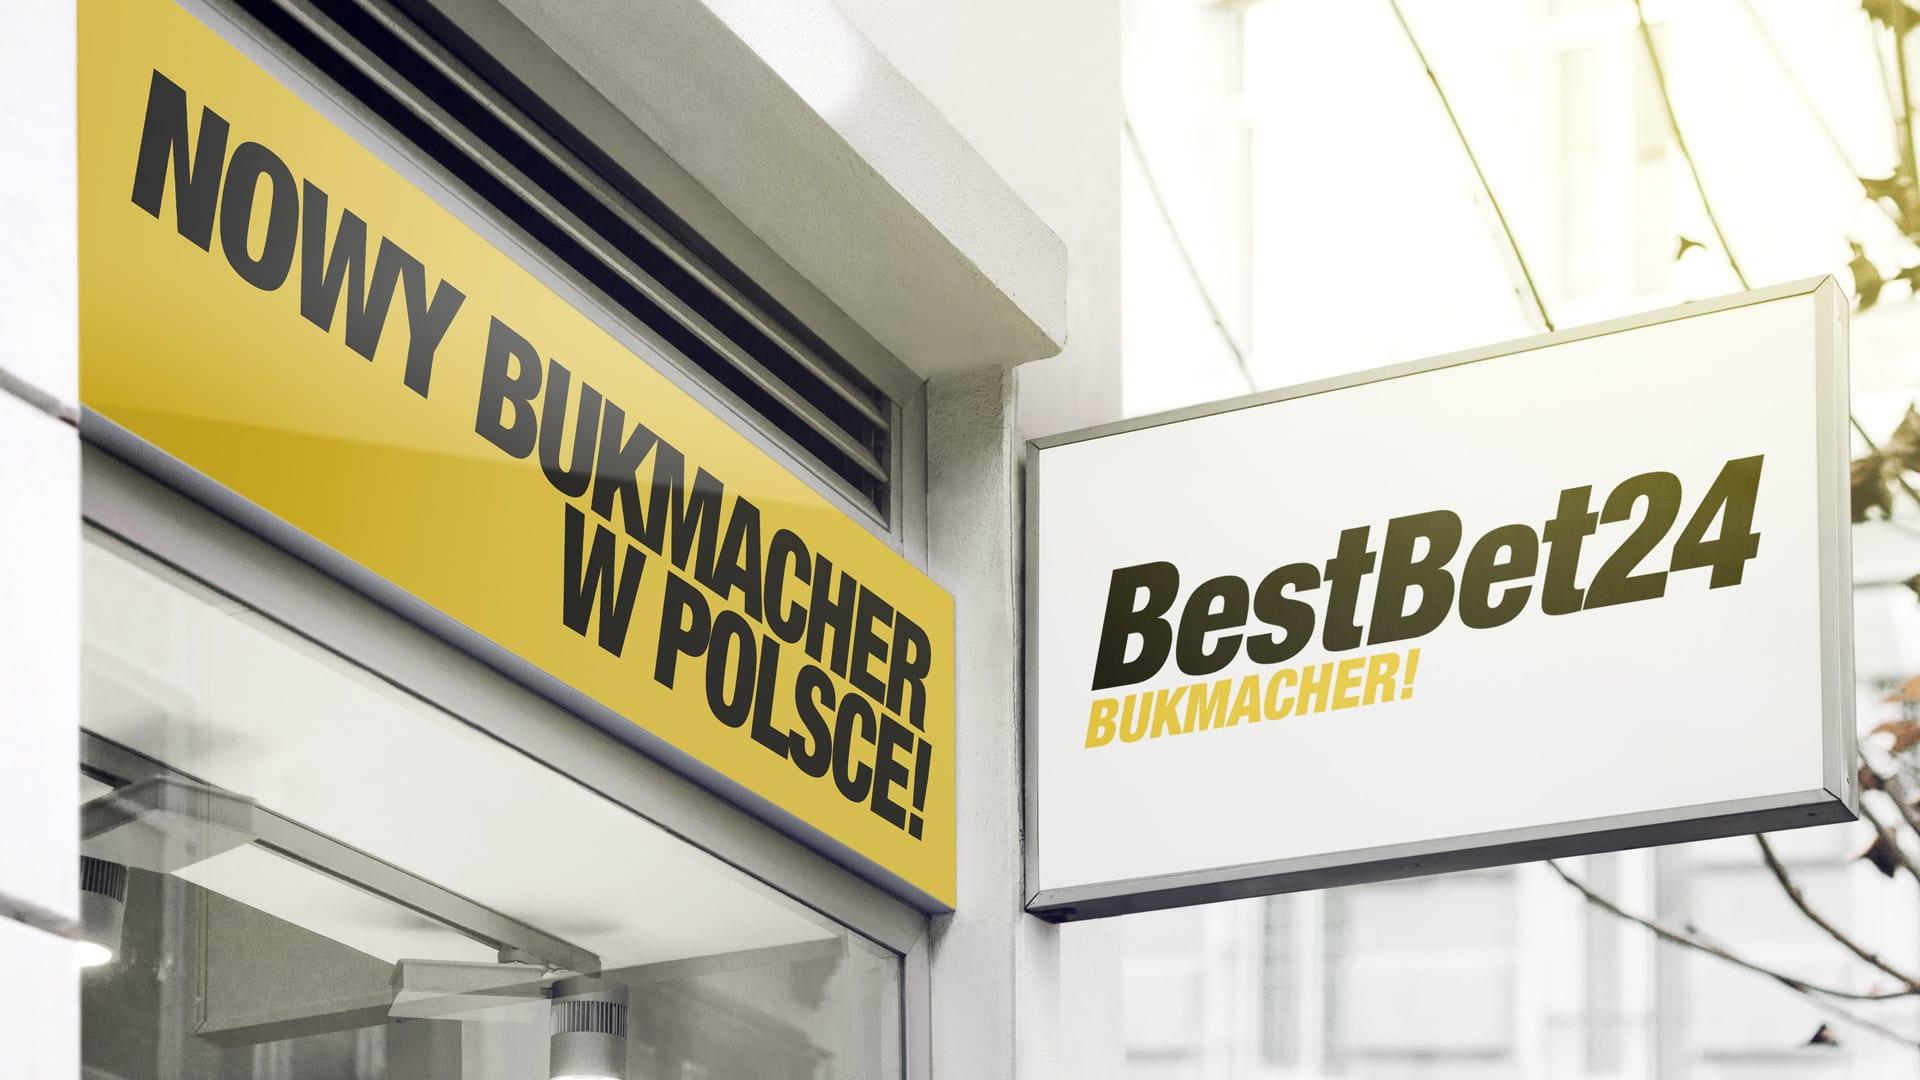 bestbet24 nowy bukmacher